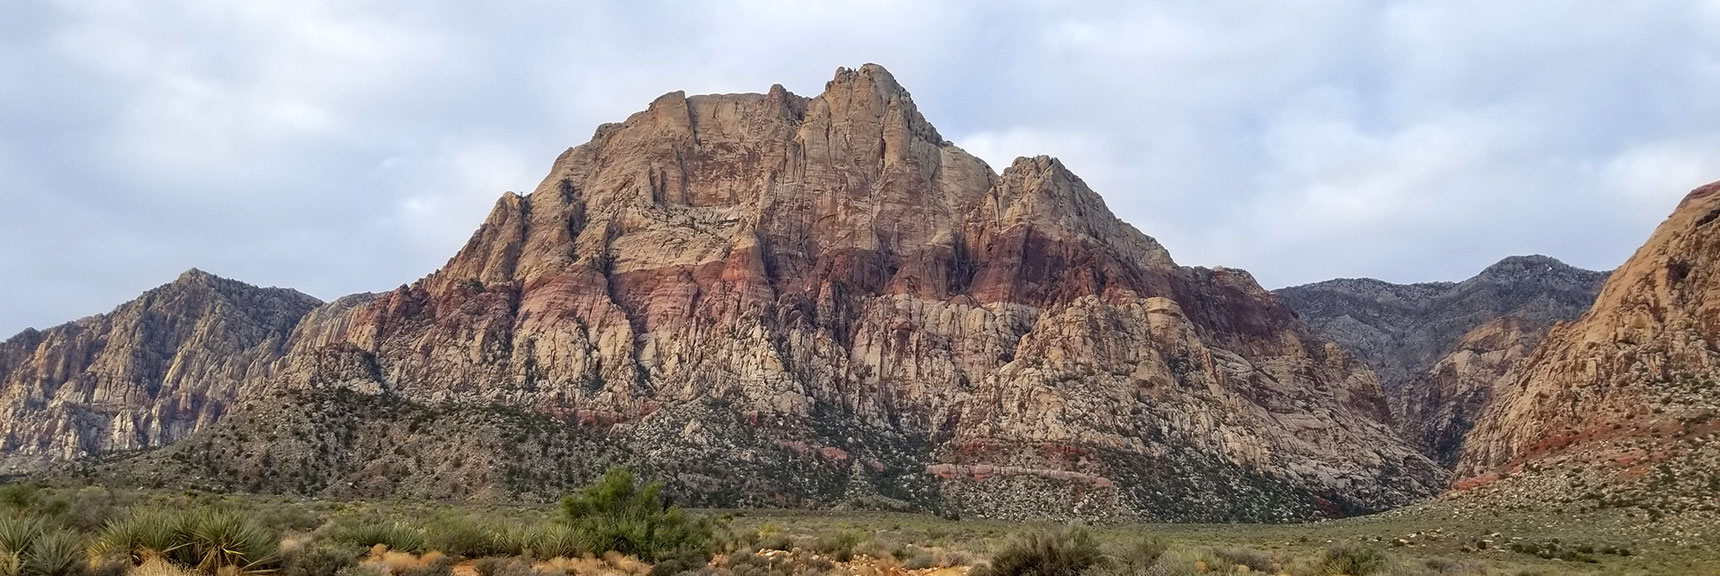 Mt. Wilson, Rainbow Mountain Wilderness, Nevada